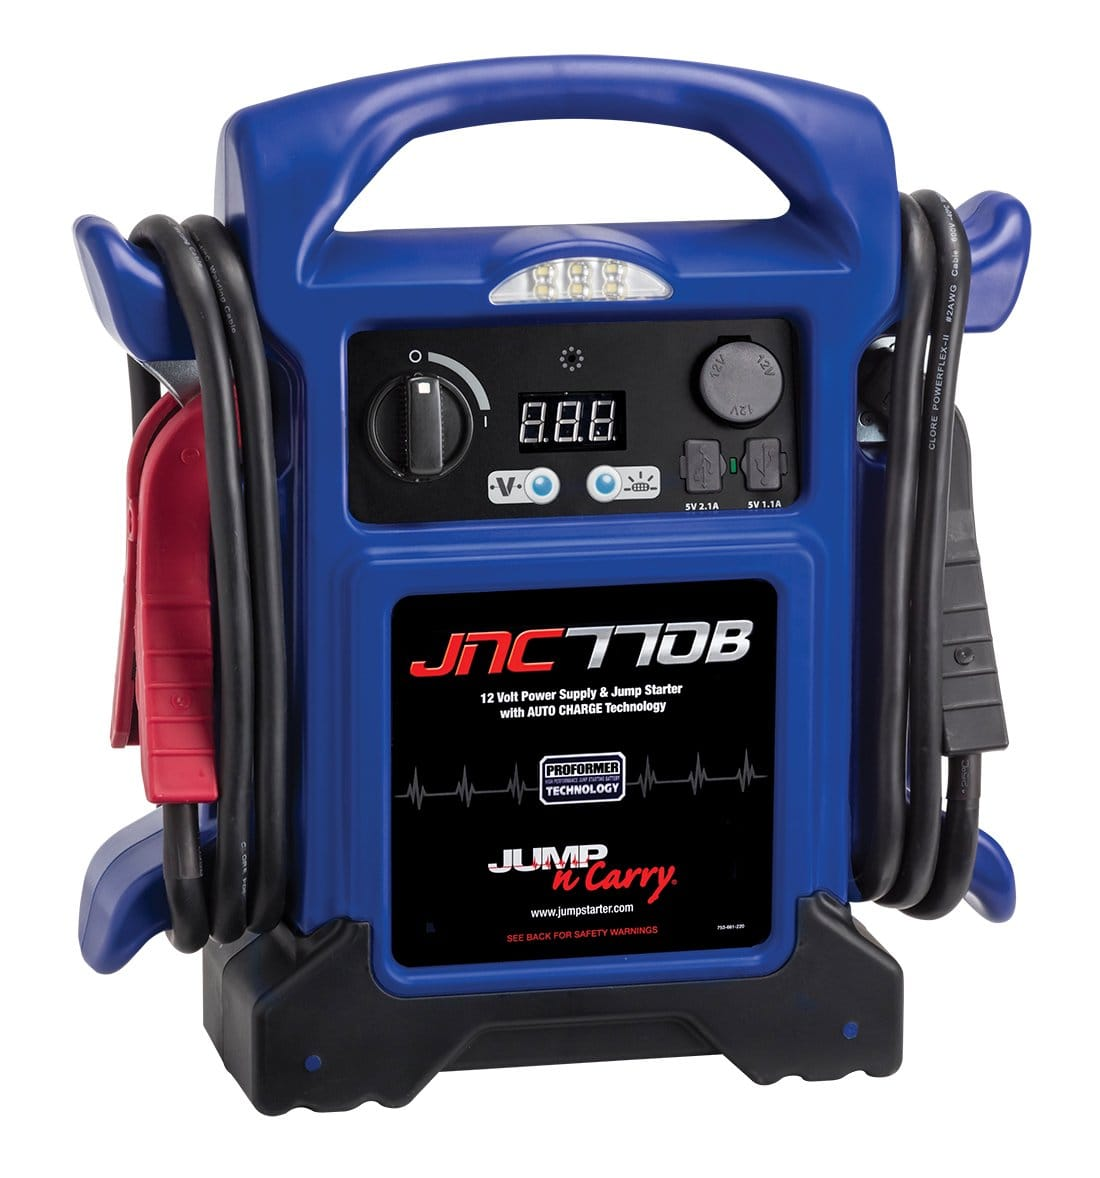 Clore Automotive Jump-N-Carry JNC770B 1700 Peak Amp Premium 12 Volt Jump Starter - Blue w/Cover $103.99 @ Amazon